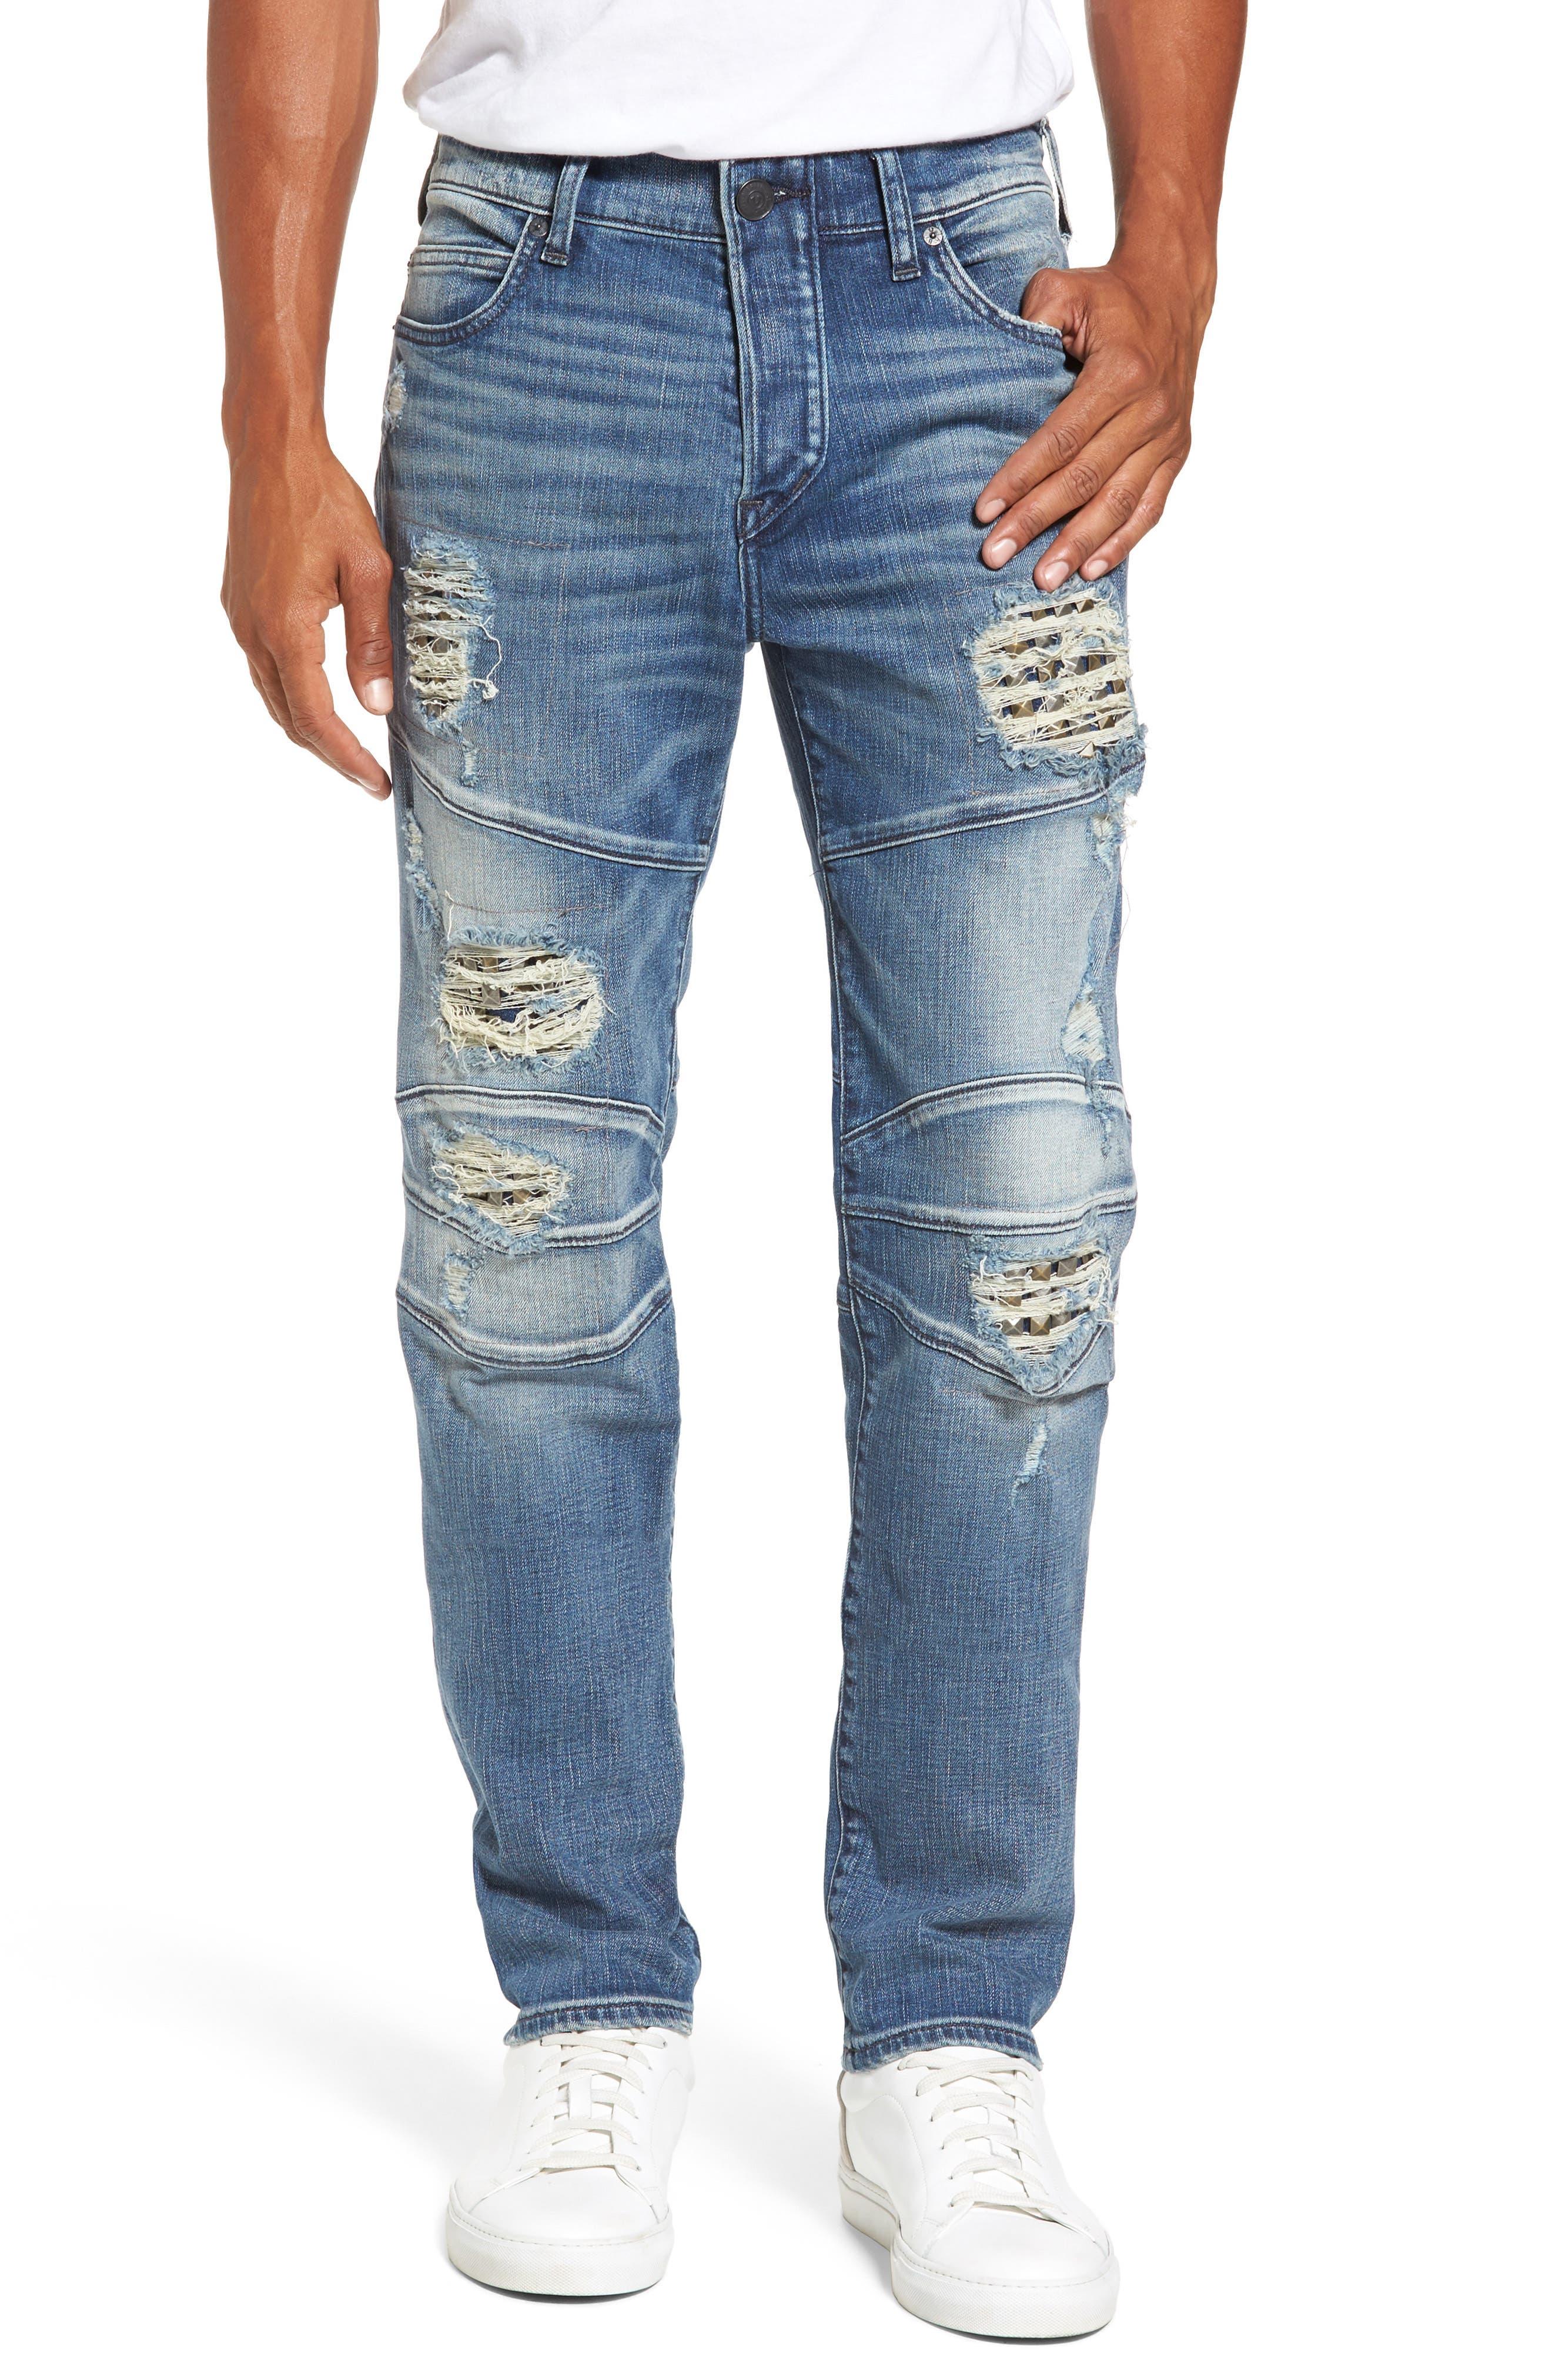 Rocco Skinny Fit Jeans,                         Main,                         color, Indigo Clutch